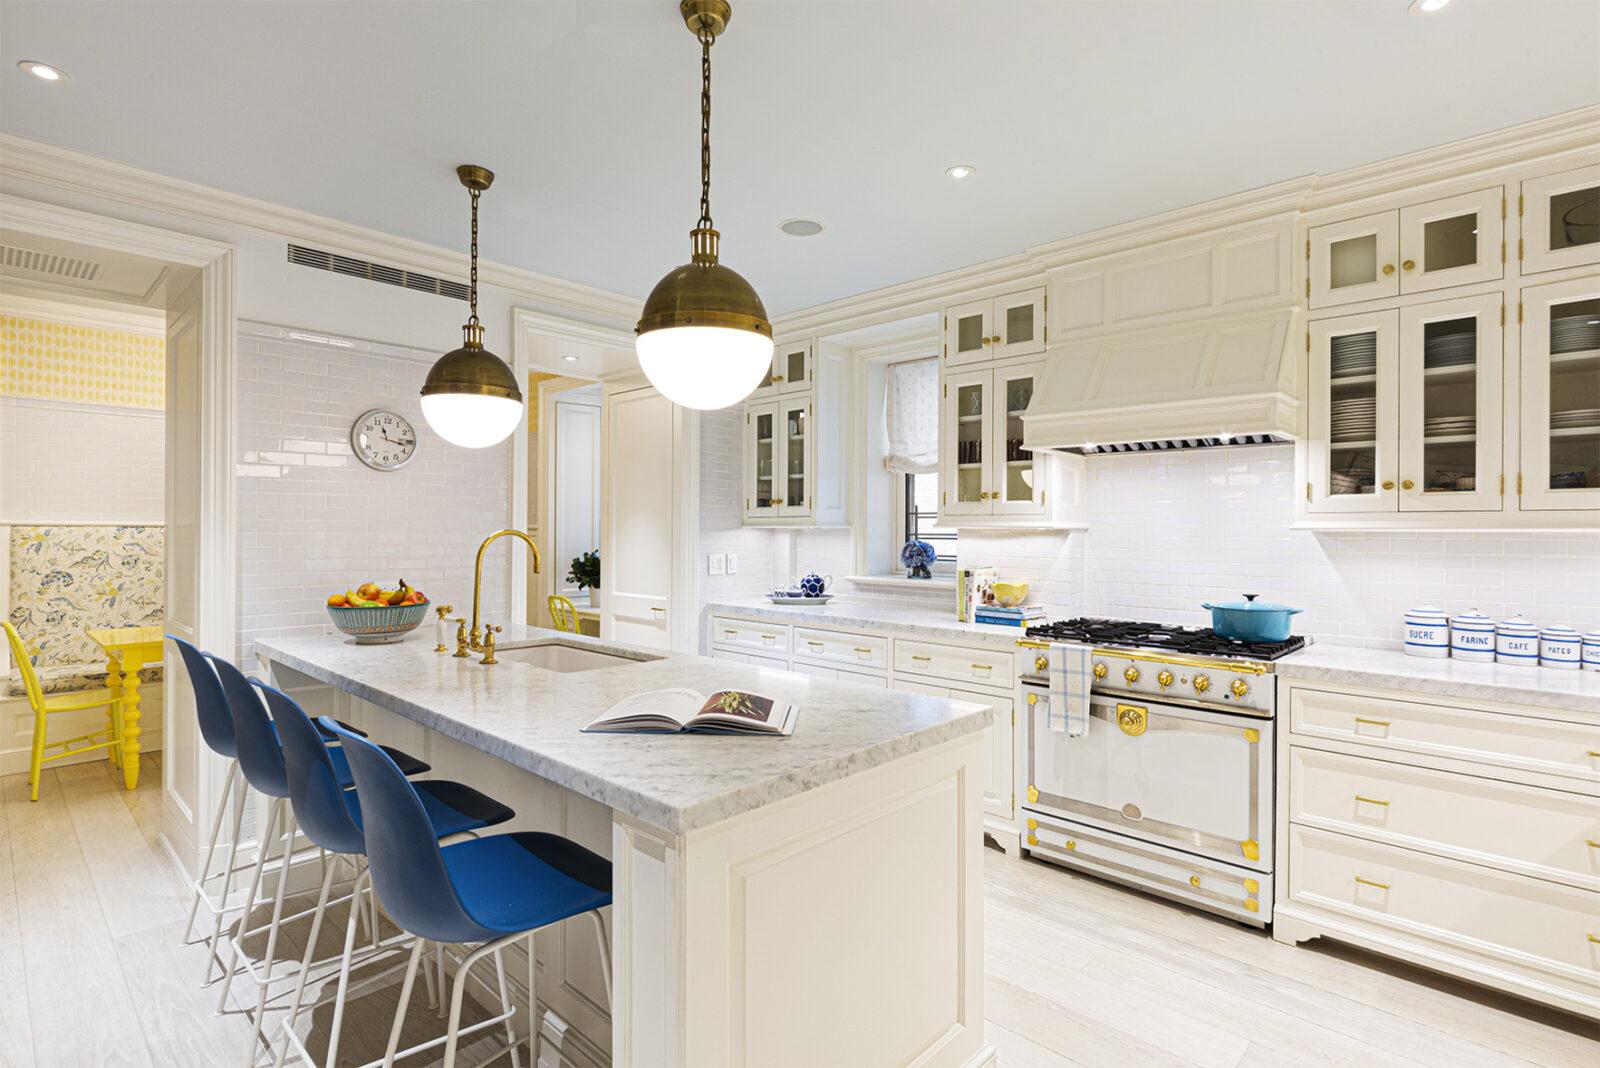 fancy kitchen with gold accents in new york manhattan